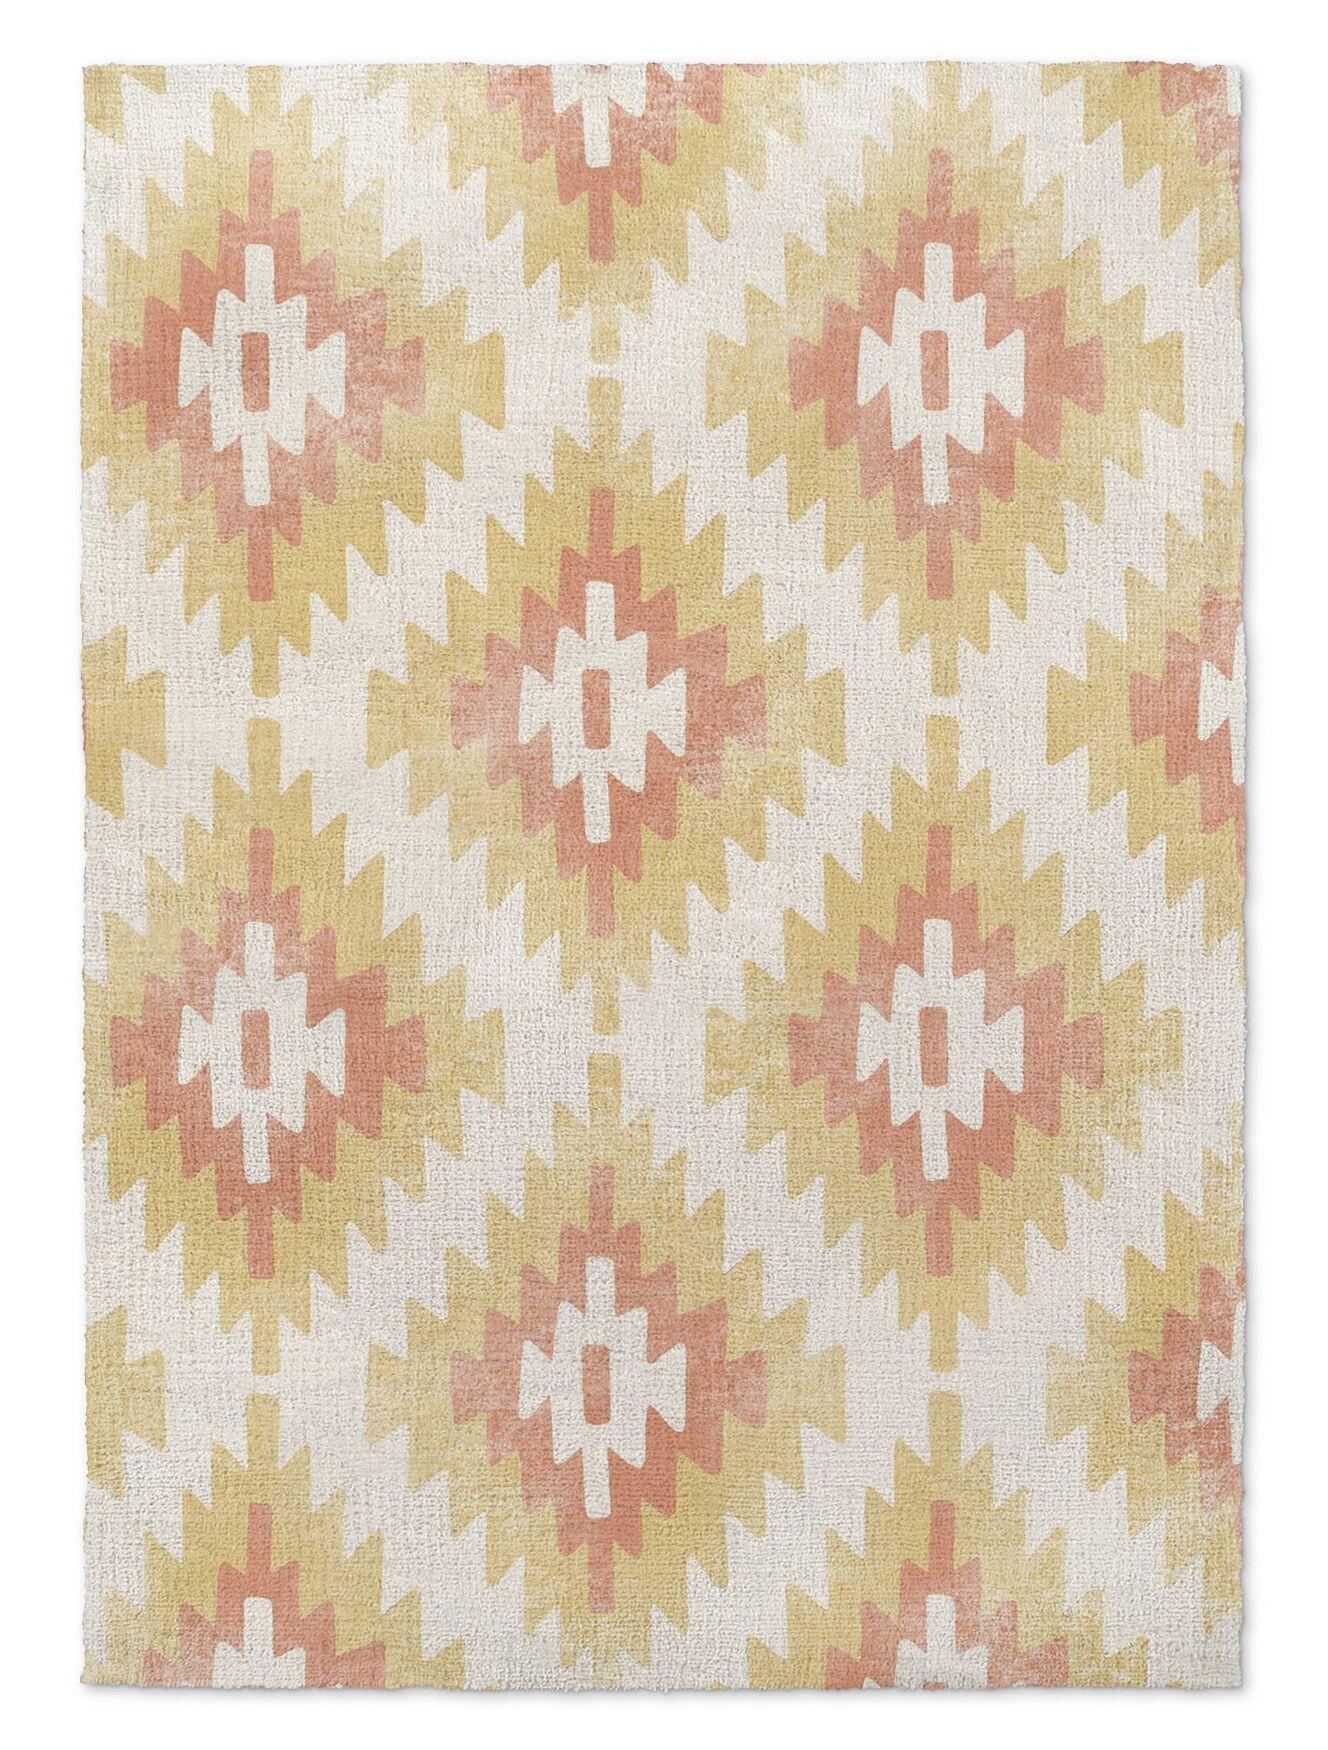 Roberta Cream/Orange/Yellow Area Rug Rug Size: Rectangle 3' x 5'